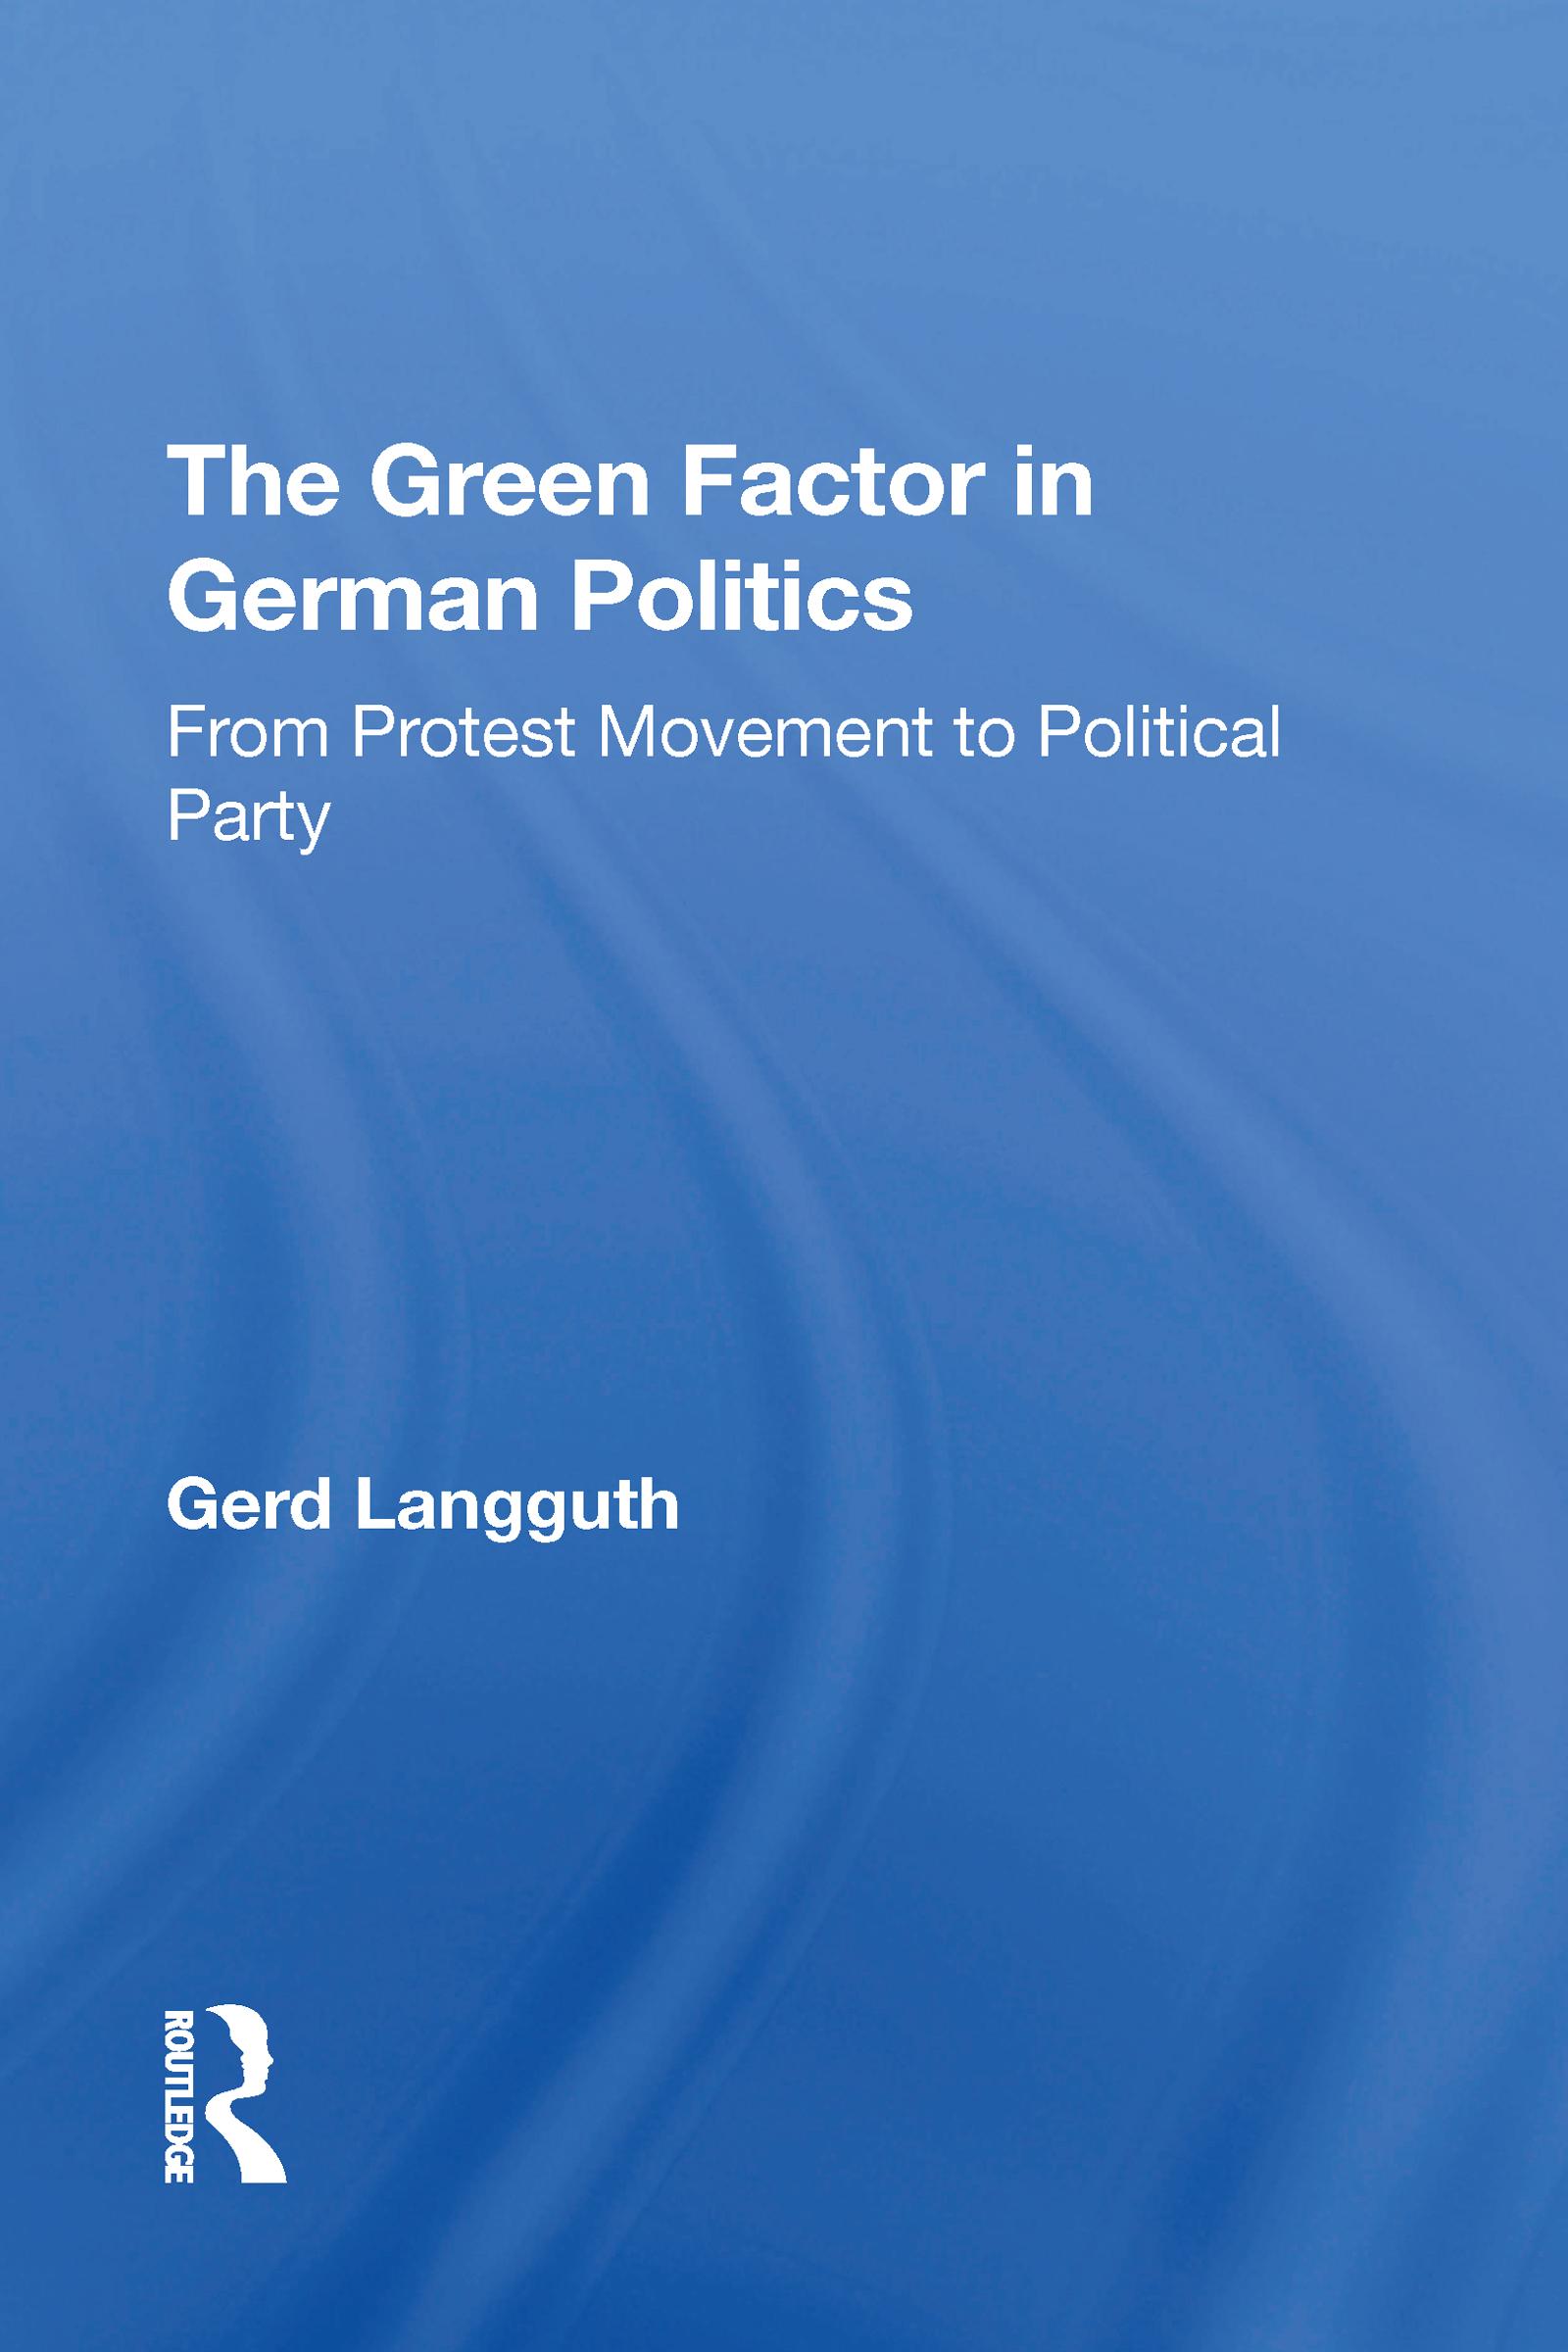 The Green Factor In German Politics